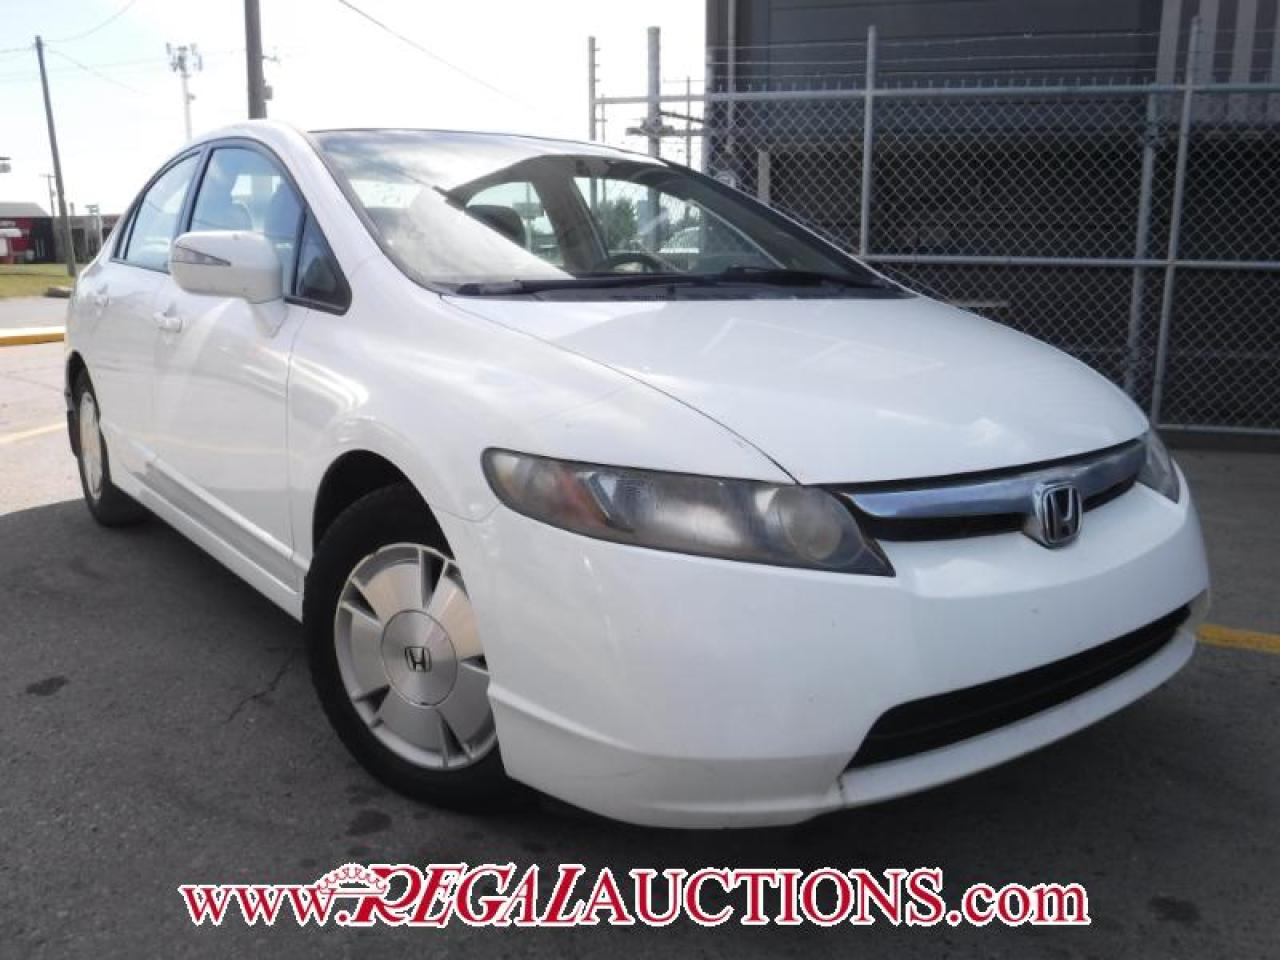 Photo of White 2008 Honda Civic